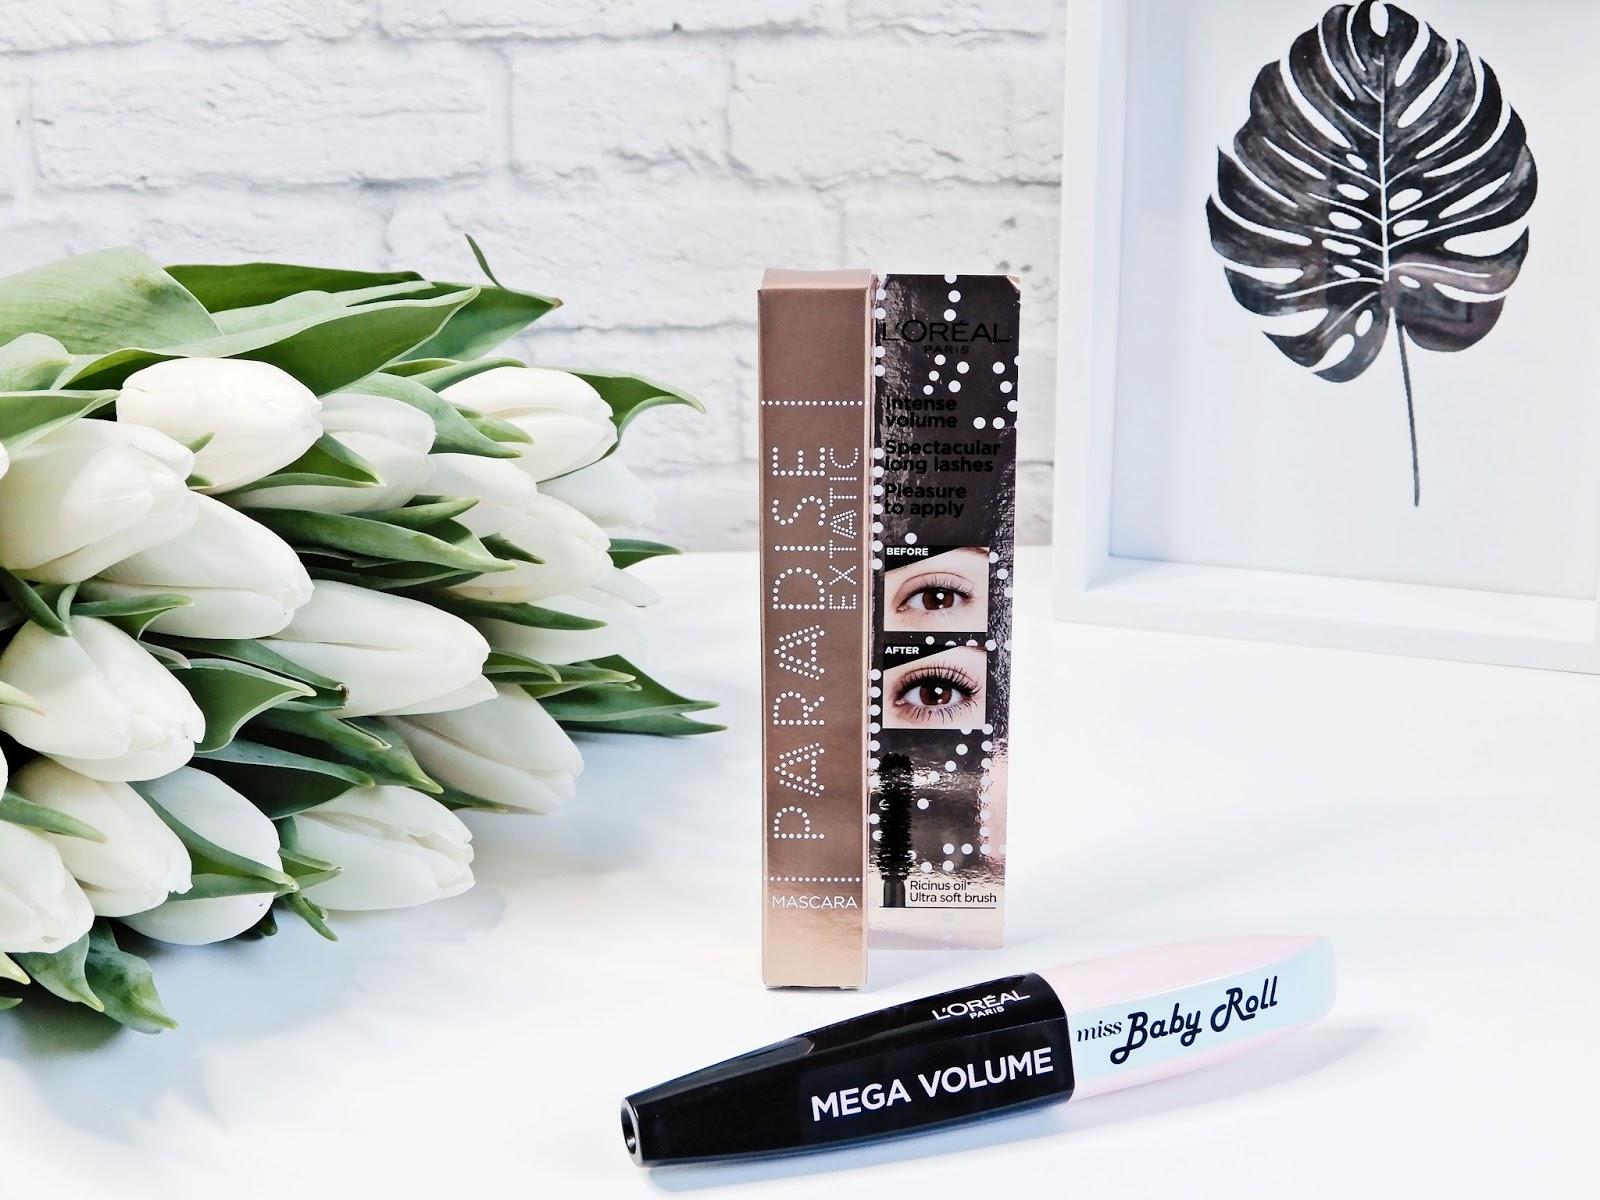 L'Oréal Paris Paradise Extatic Mascara, L'Oréal Mega Volume miss Baby Roll Mascara,